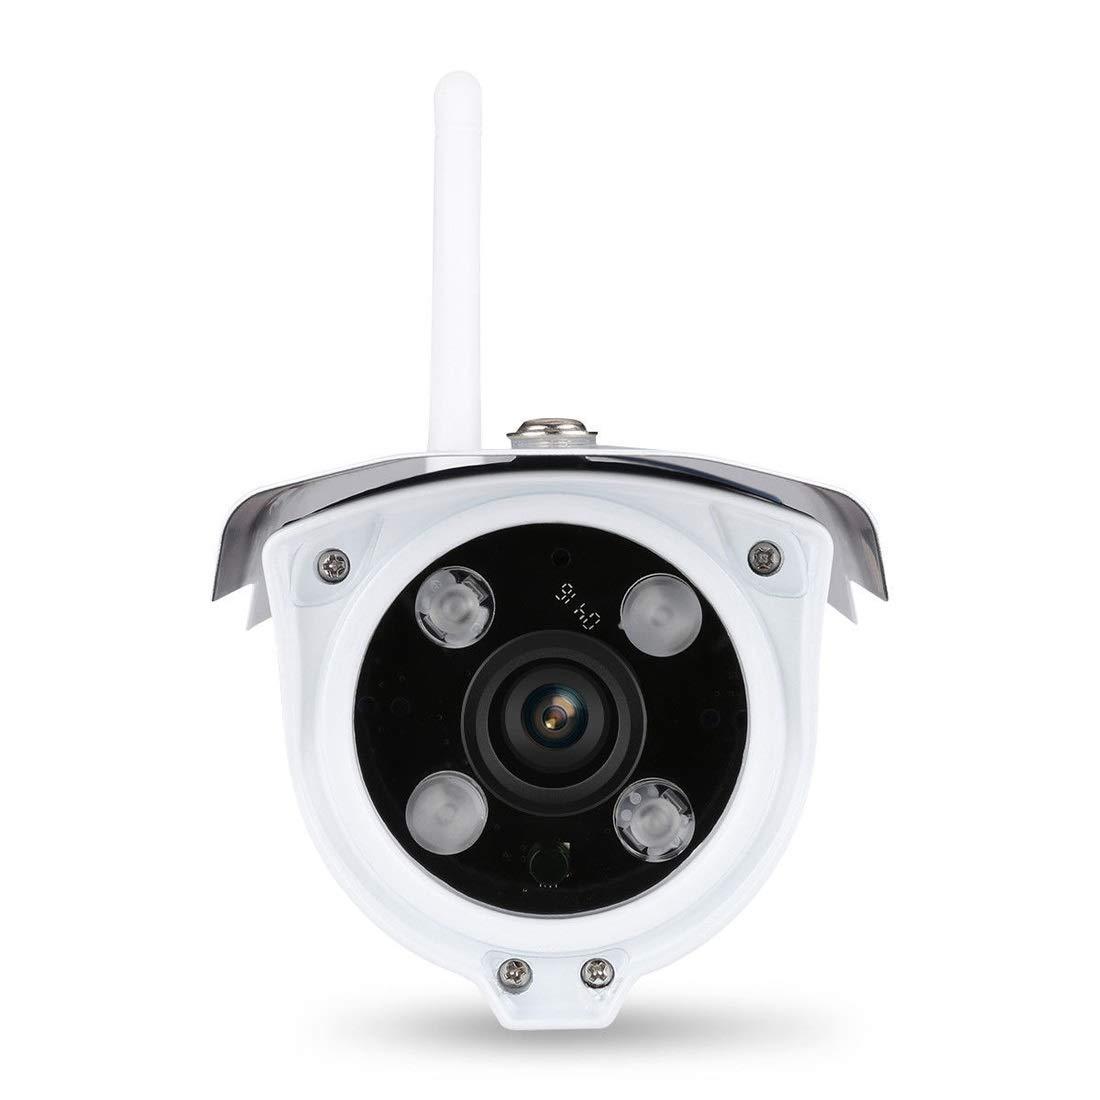 JPAKIOS HD屋外ウェブカメラ赤外線ナイトビジョンセキュリティ監視カメラ (色 : : ホワイト) JPAKIOS ホワイト ホワイト) B07QQQNL1H, 青森ほたて本舗:6b65d406 --- m2cweb.com